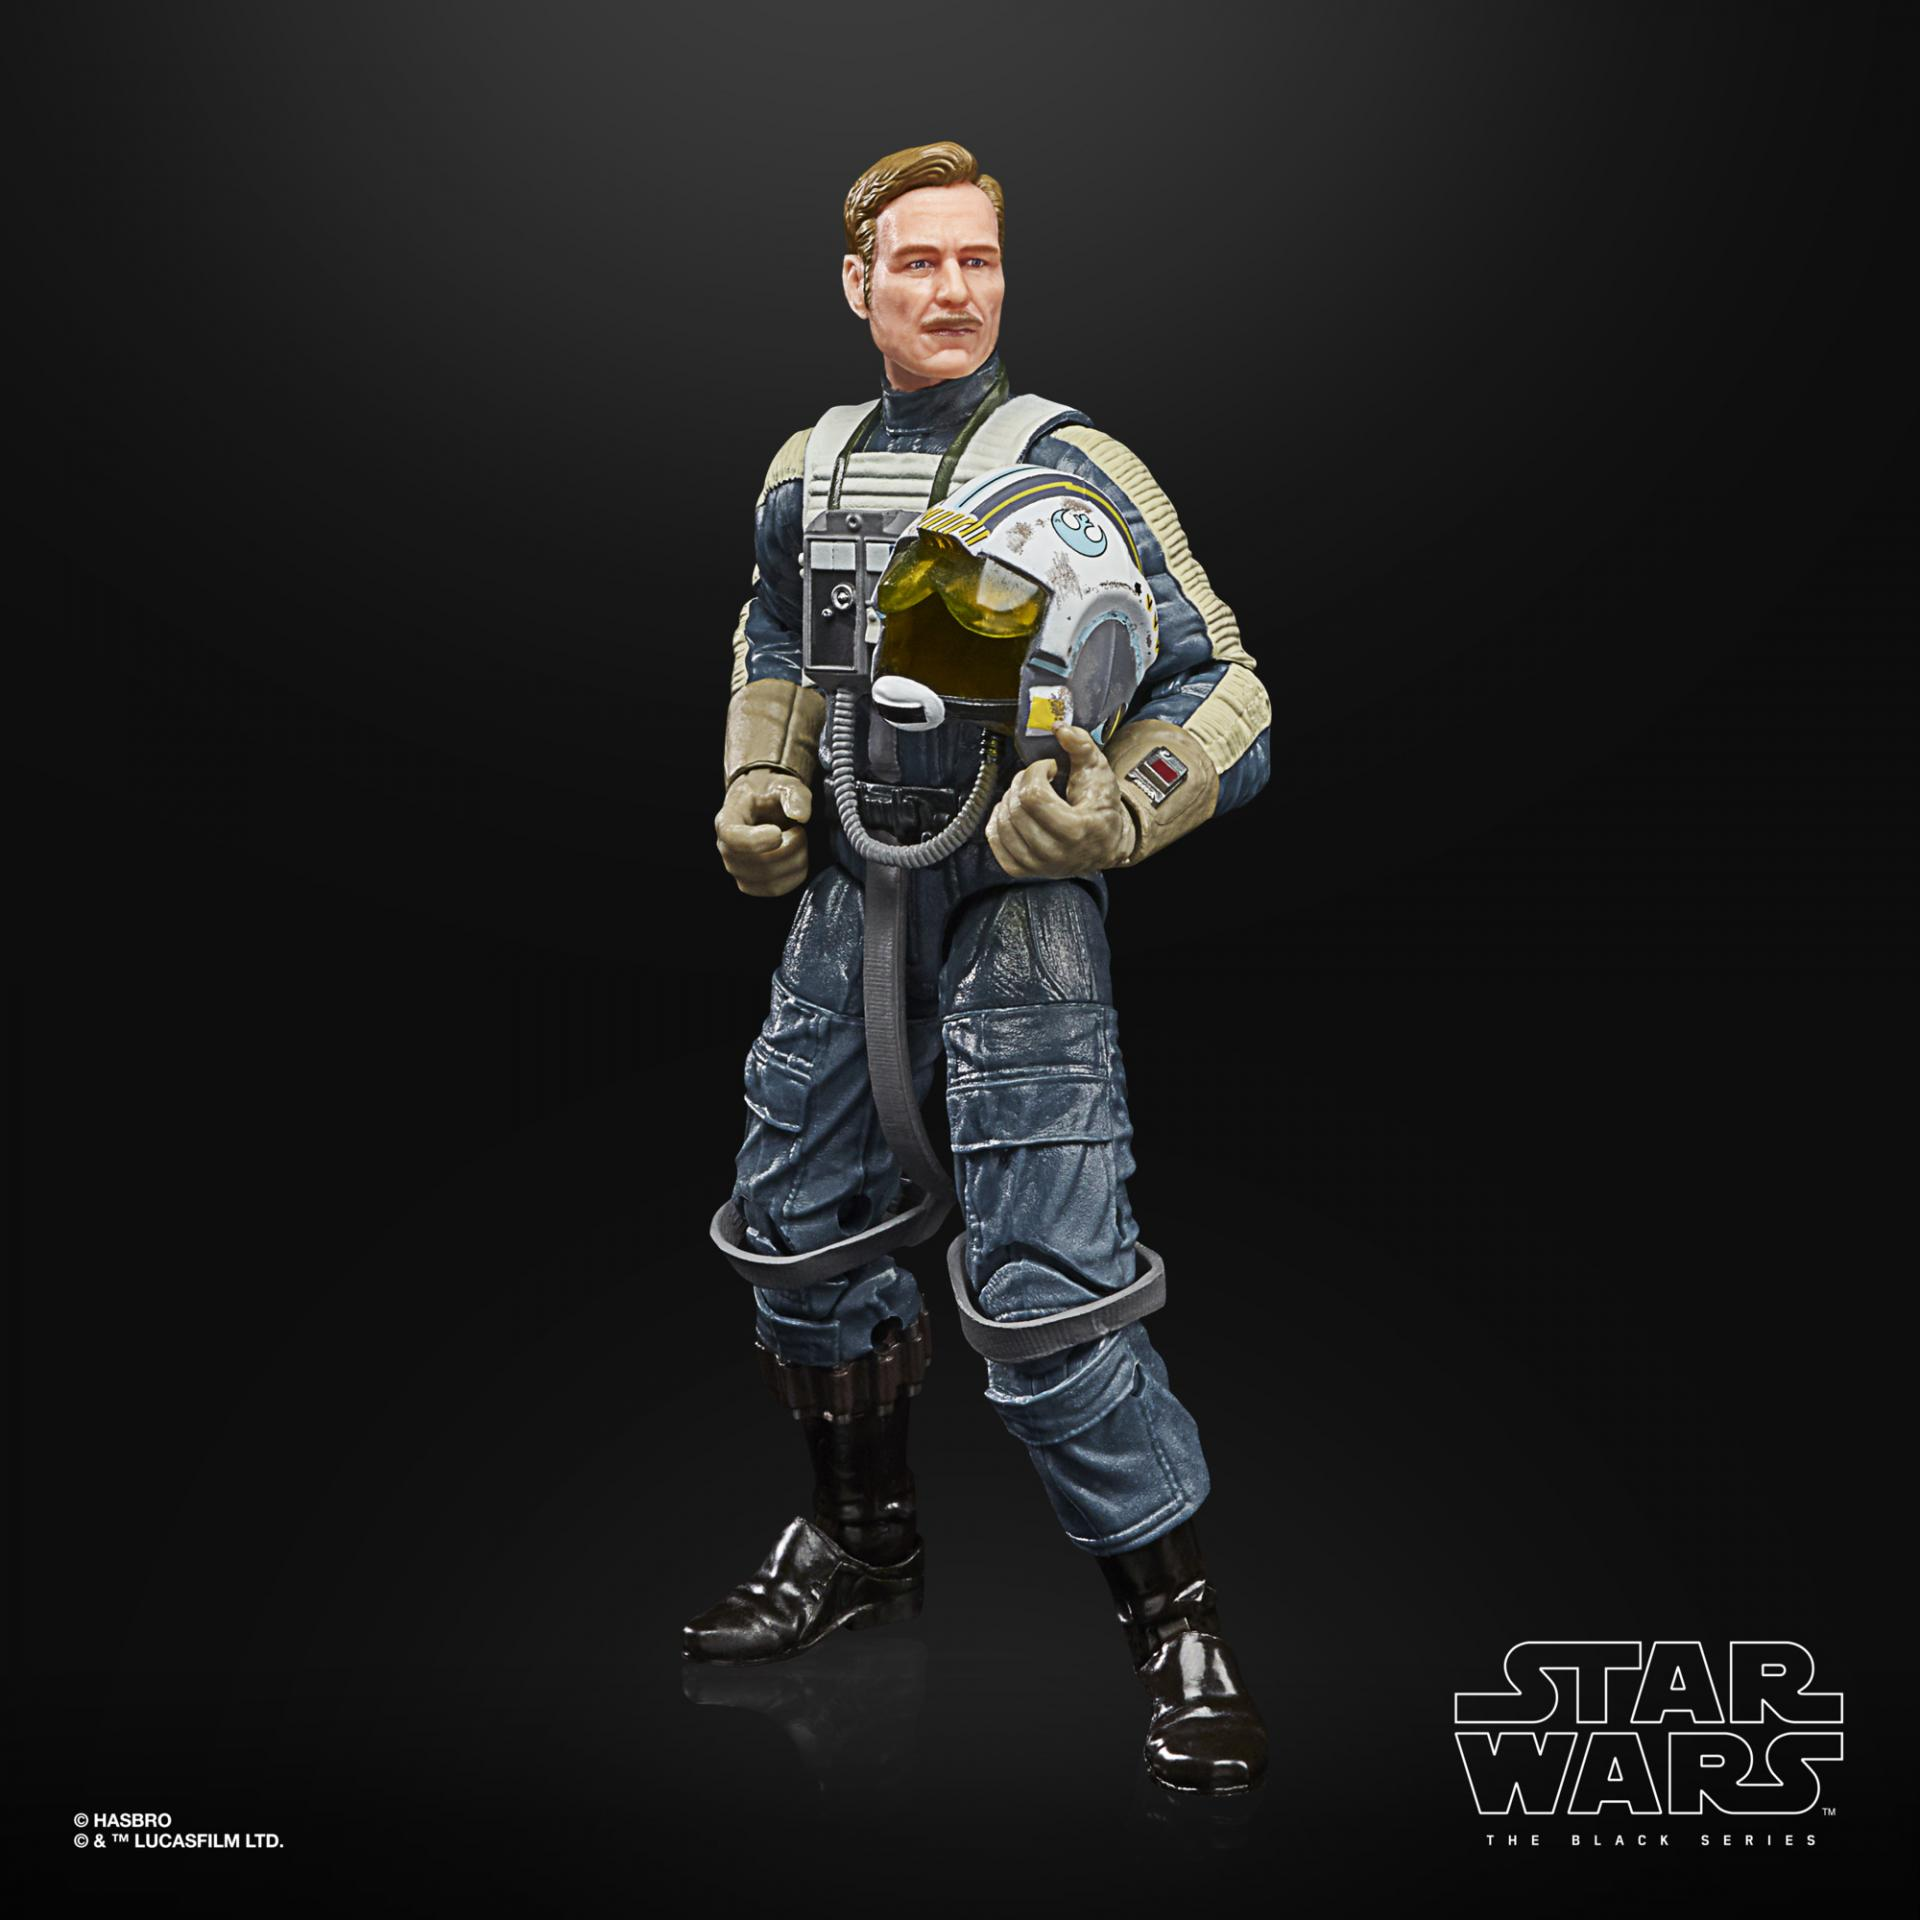 Star wars the black series antoc merrick 15cm5